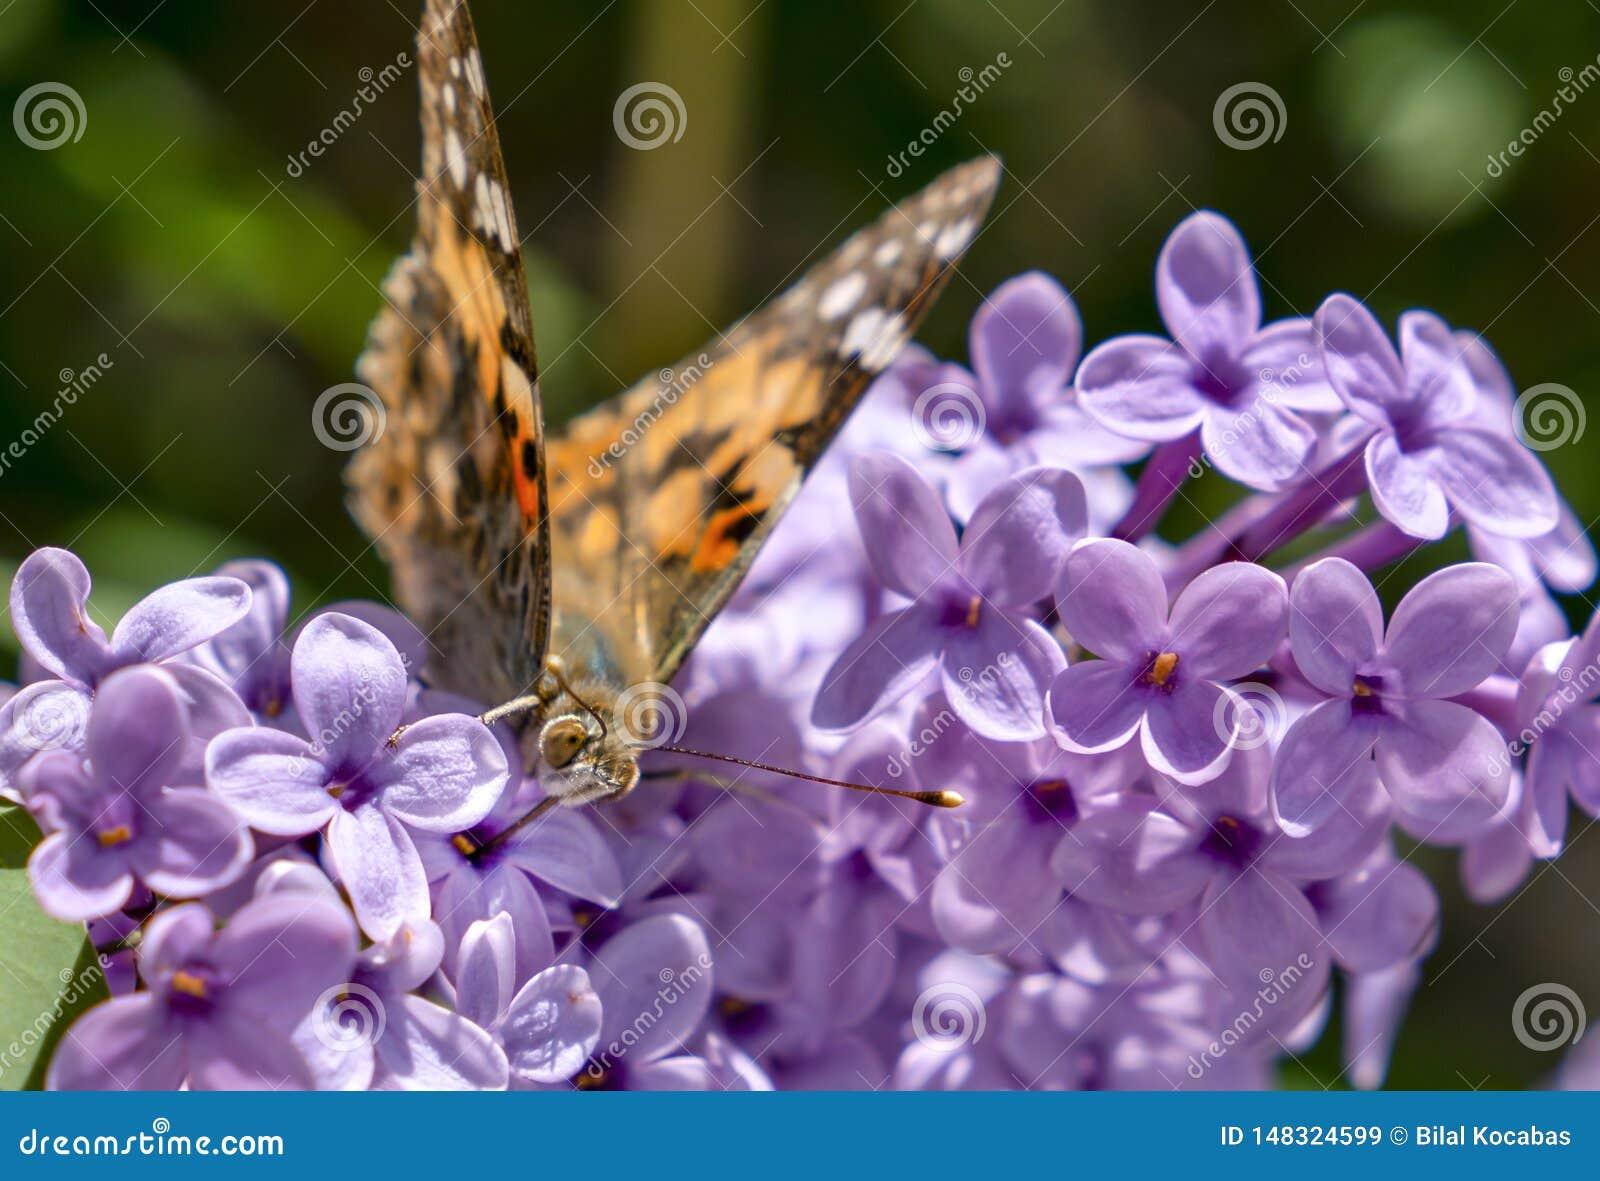 Painted Lady butterfly vanessa Cardui on a summer lilac bush Buddleja davidii